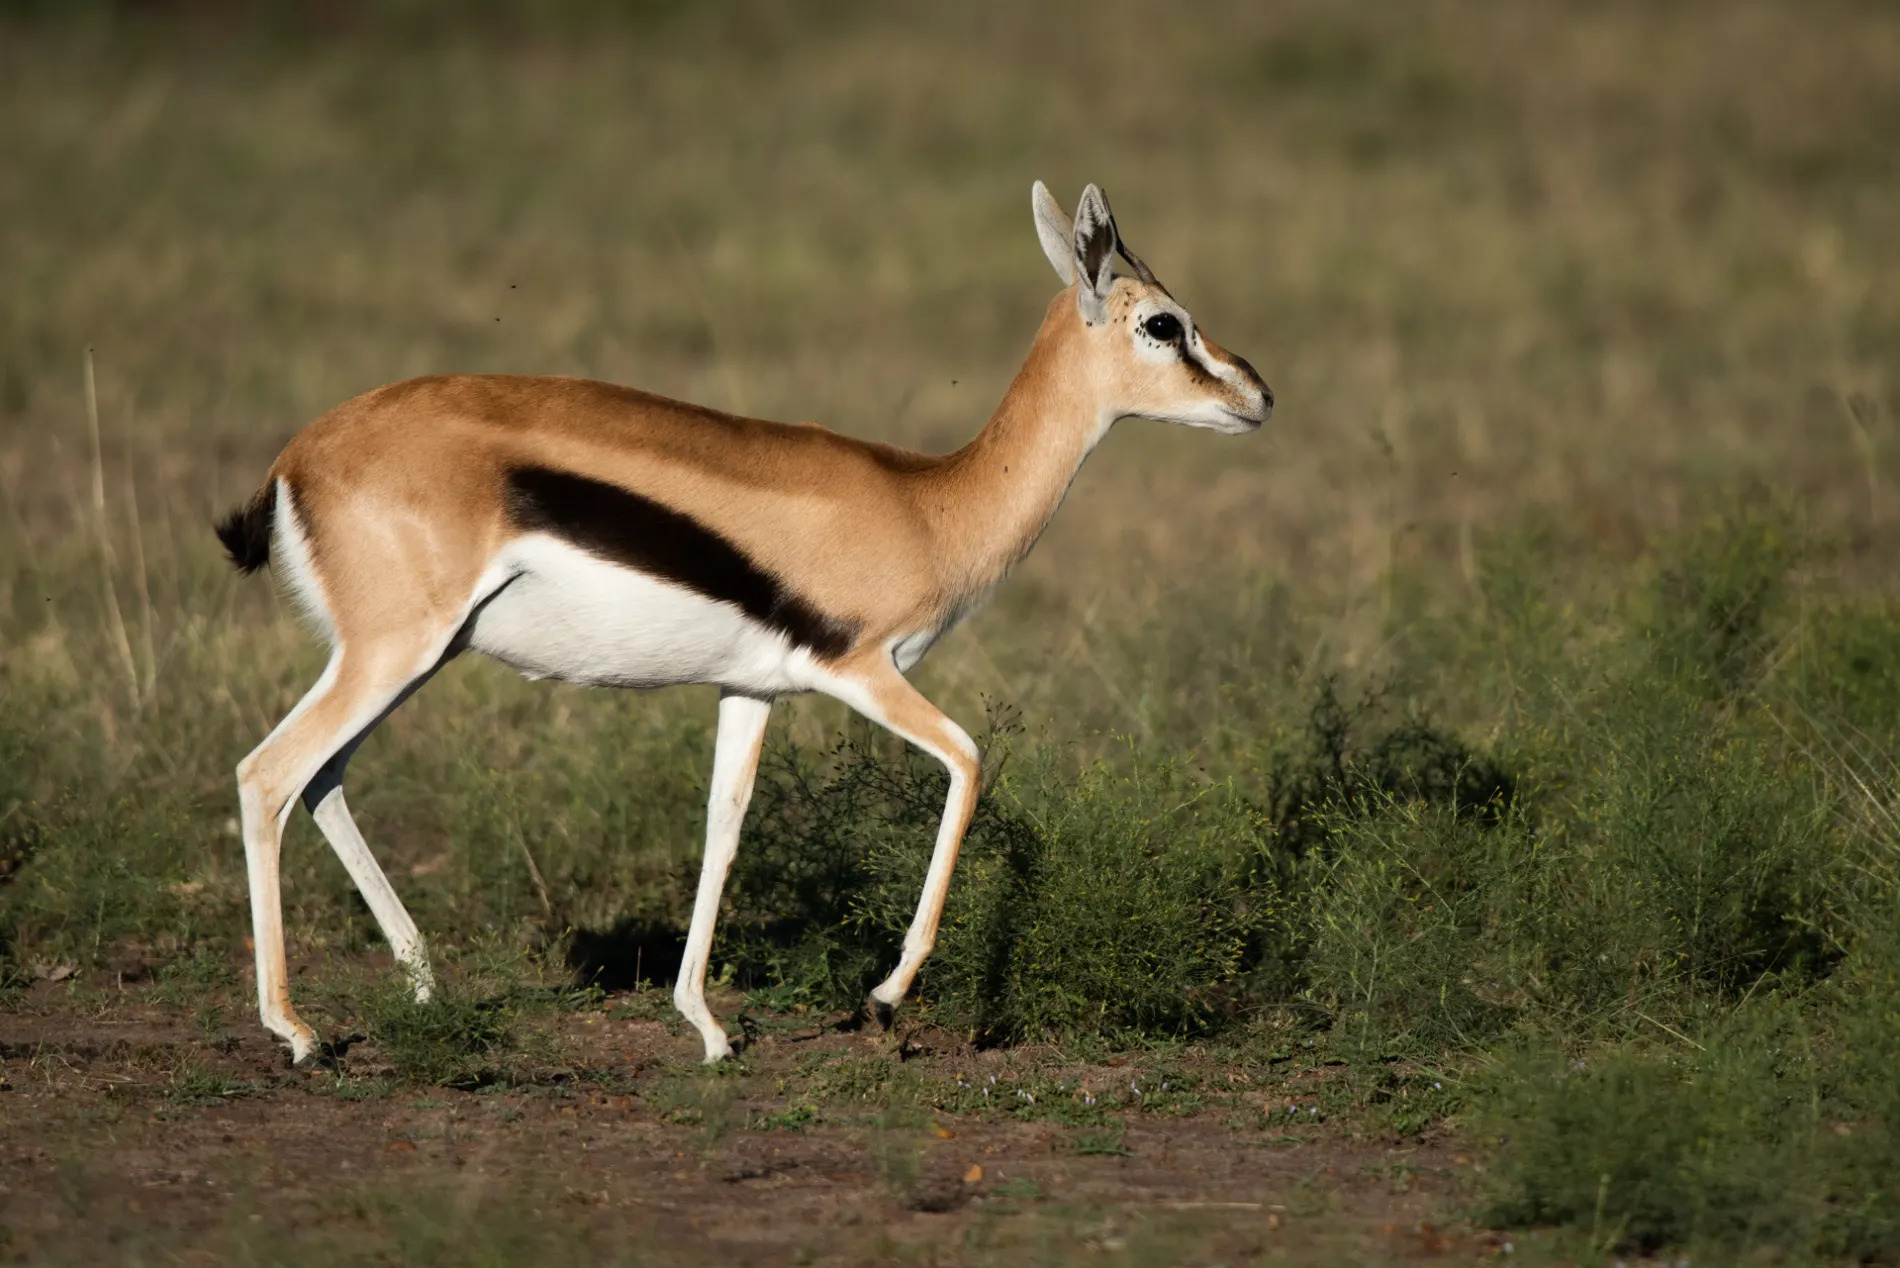 Gazelle mom